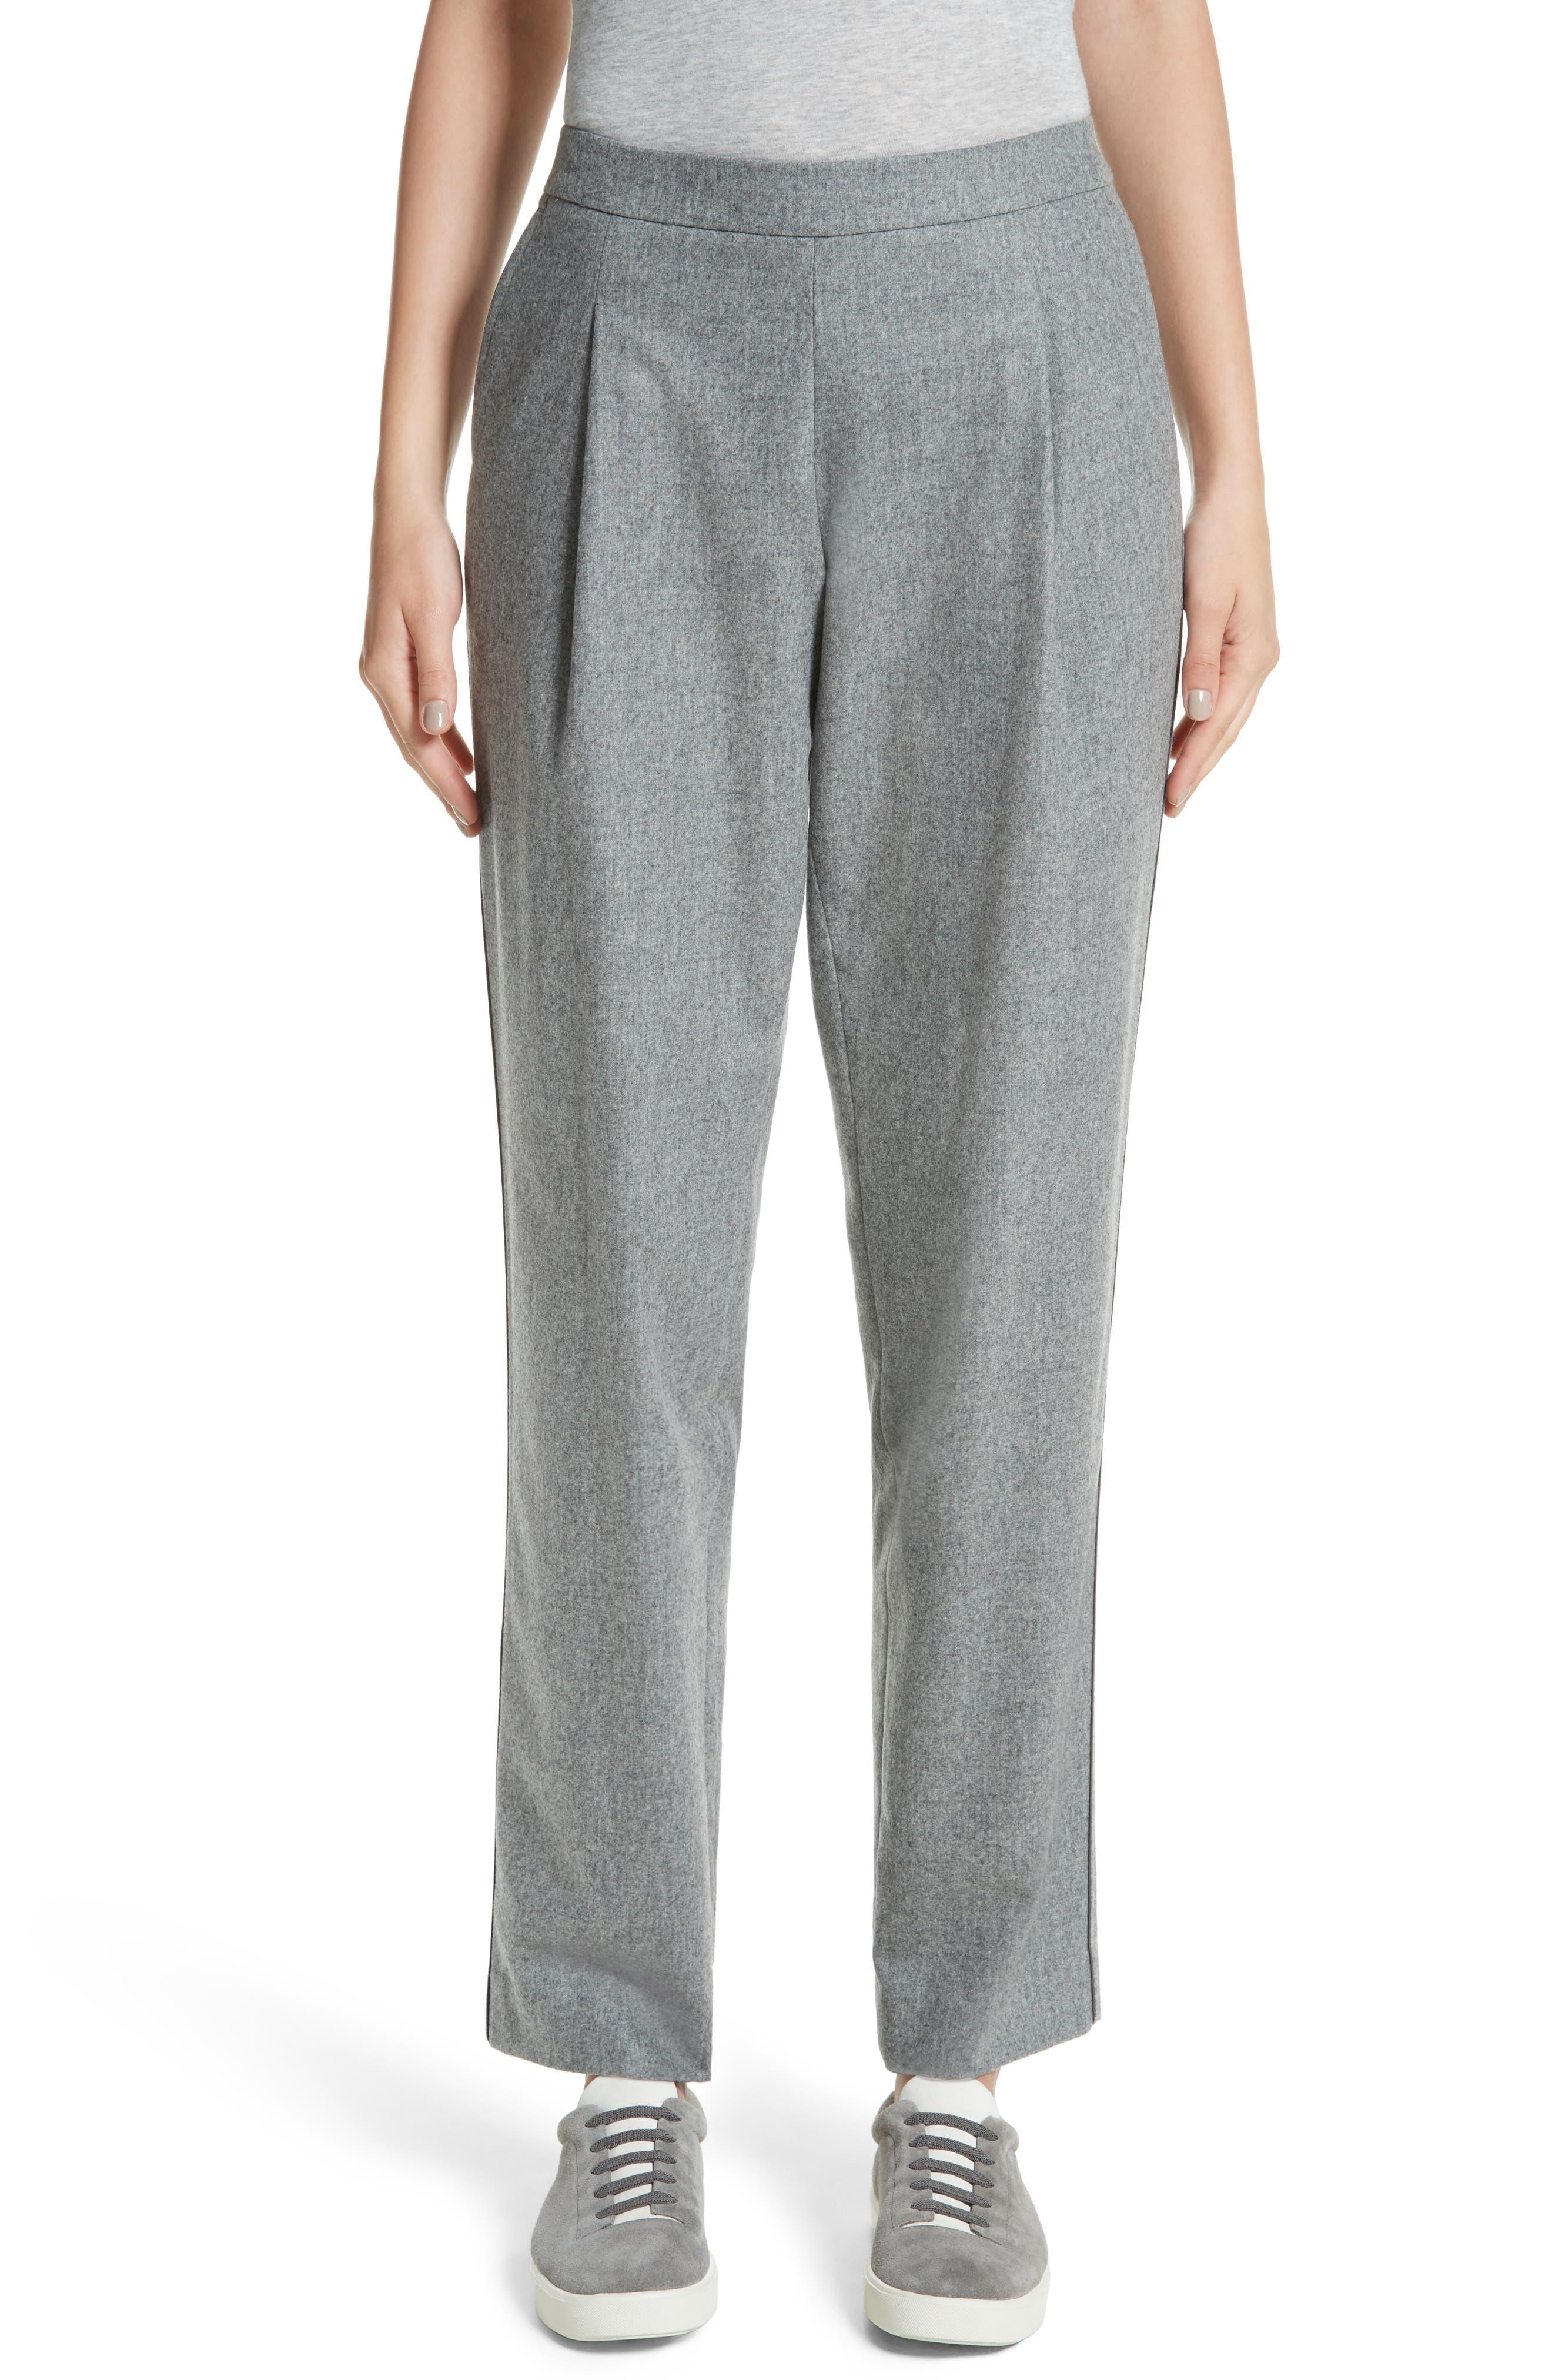 Alternate Image 1 Selected - Lafayette 148 New York Finite Flannel Soho Track Pants